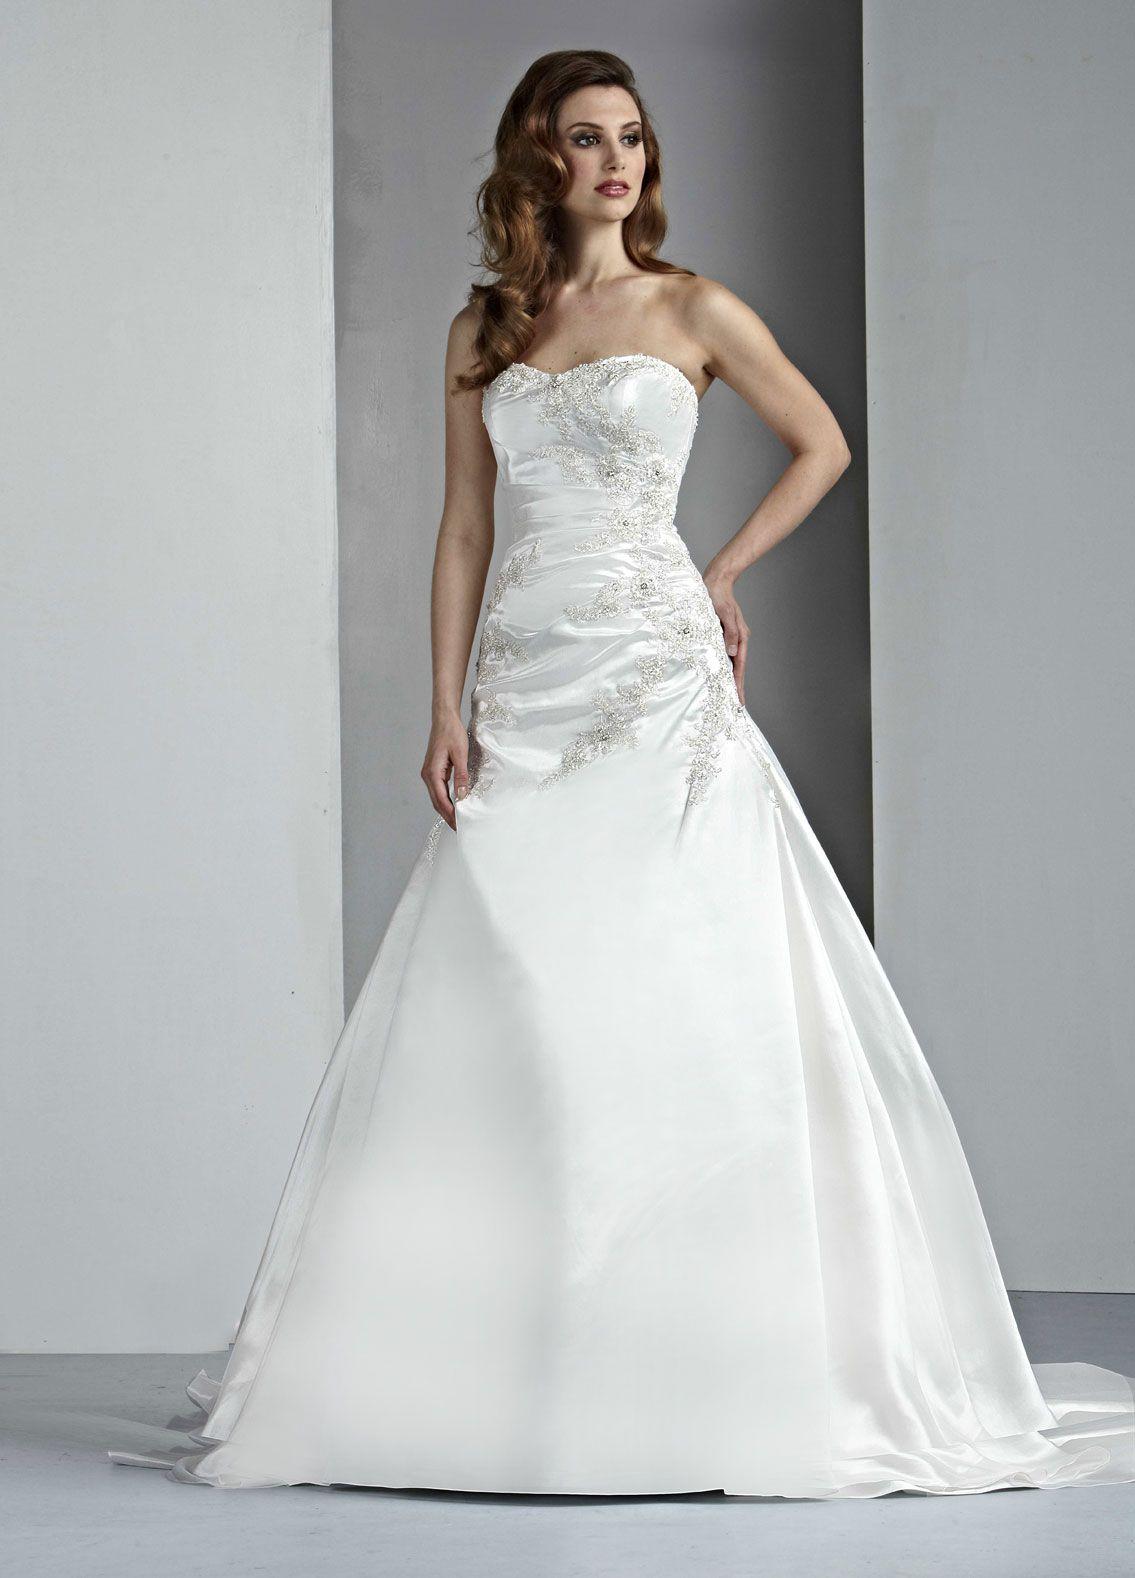 Da Vinci Bridal Style 50033 | wedding dresses | Pinterest | Bridal ...